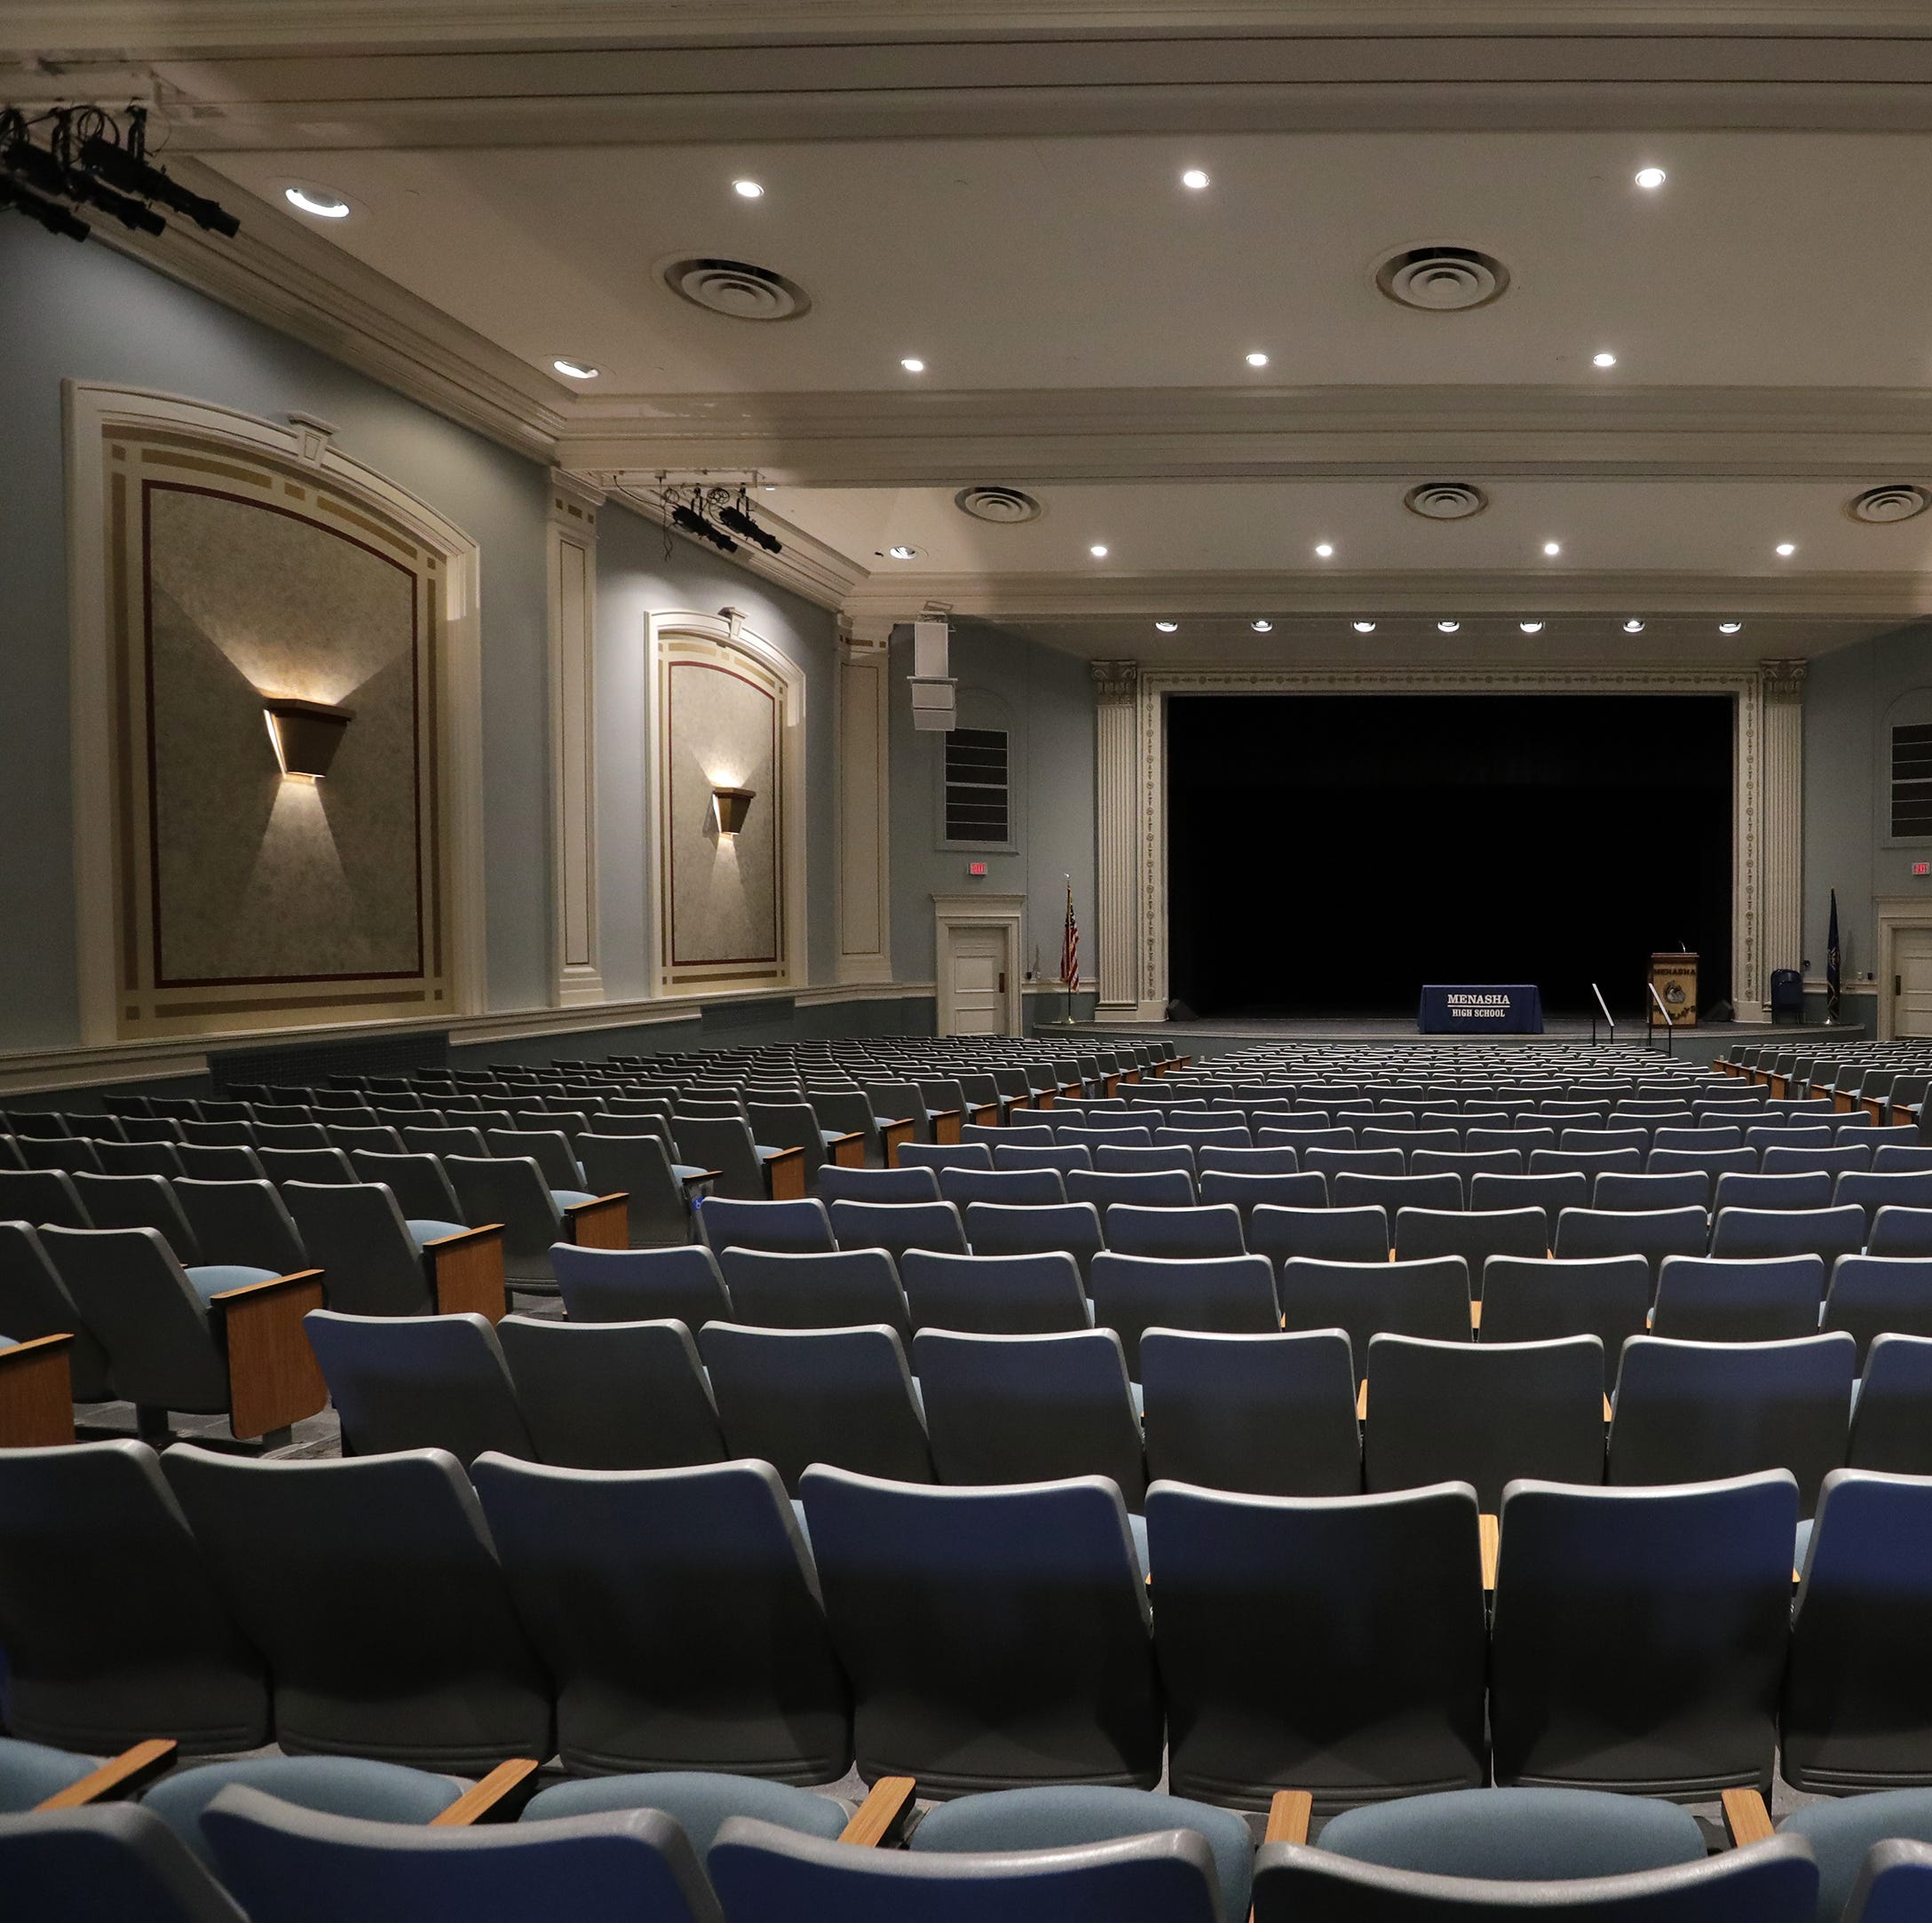 Musty odor inside Menasha High School auditorium lingers despite multiple cleanings